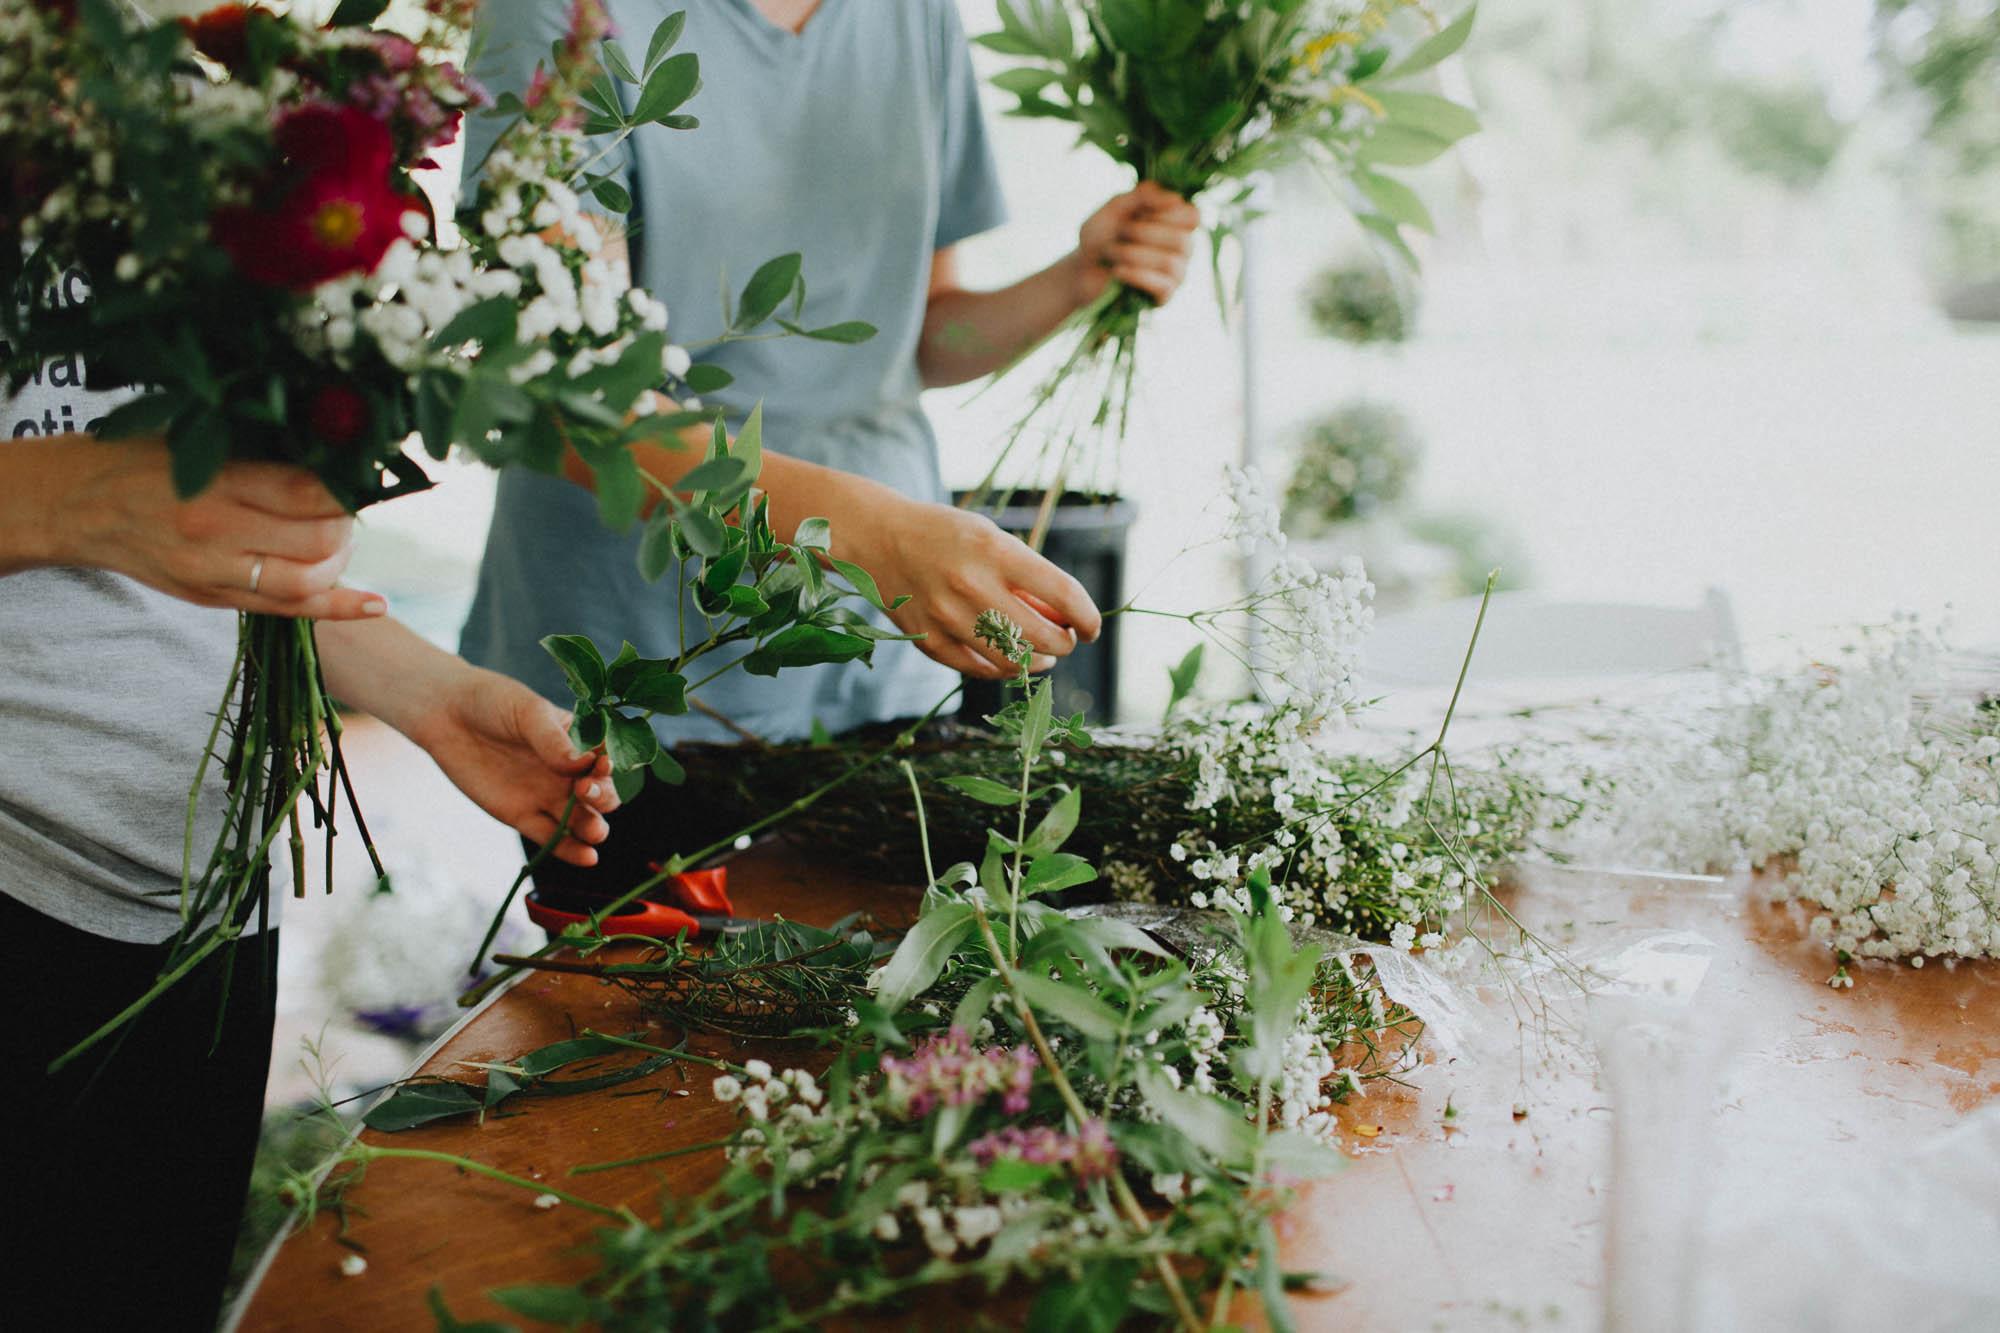 Leah-Graham-Michigan-Outdoor-DIY-Wedding-010@2x.jpg